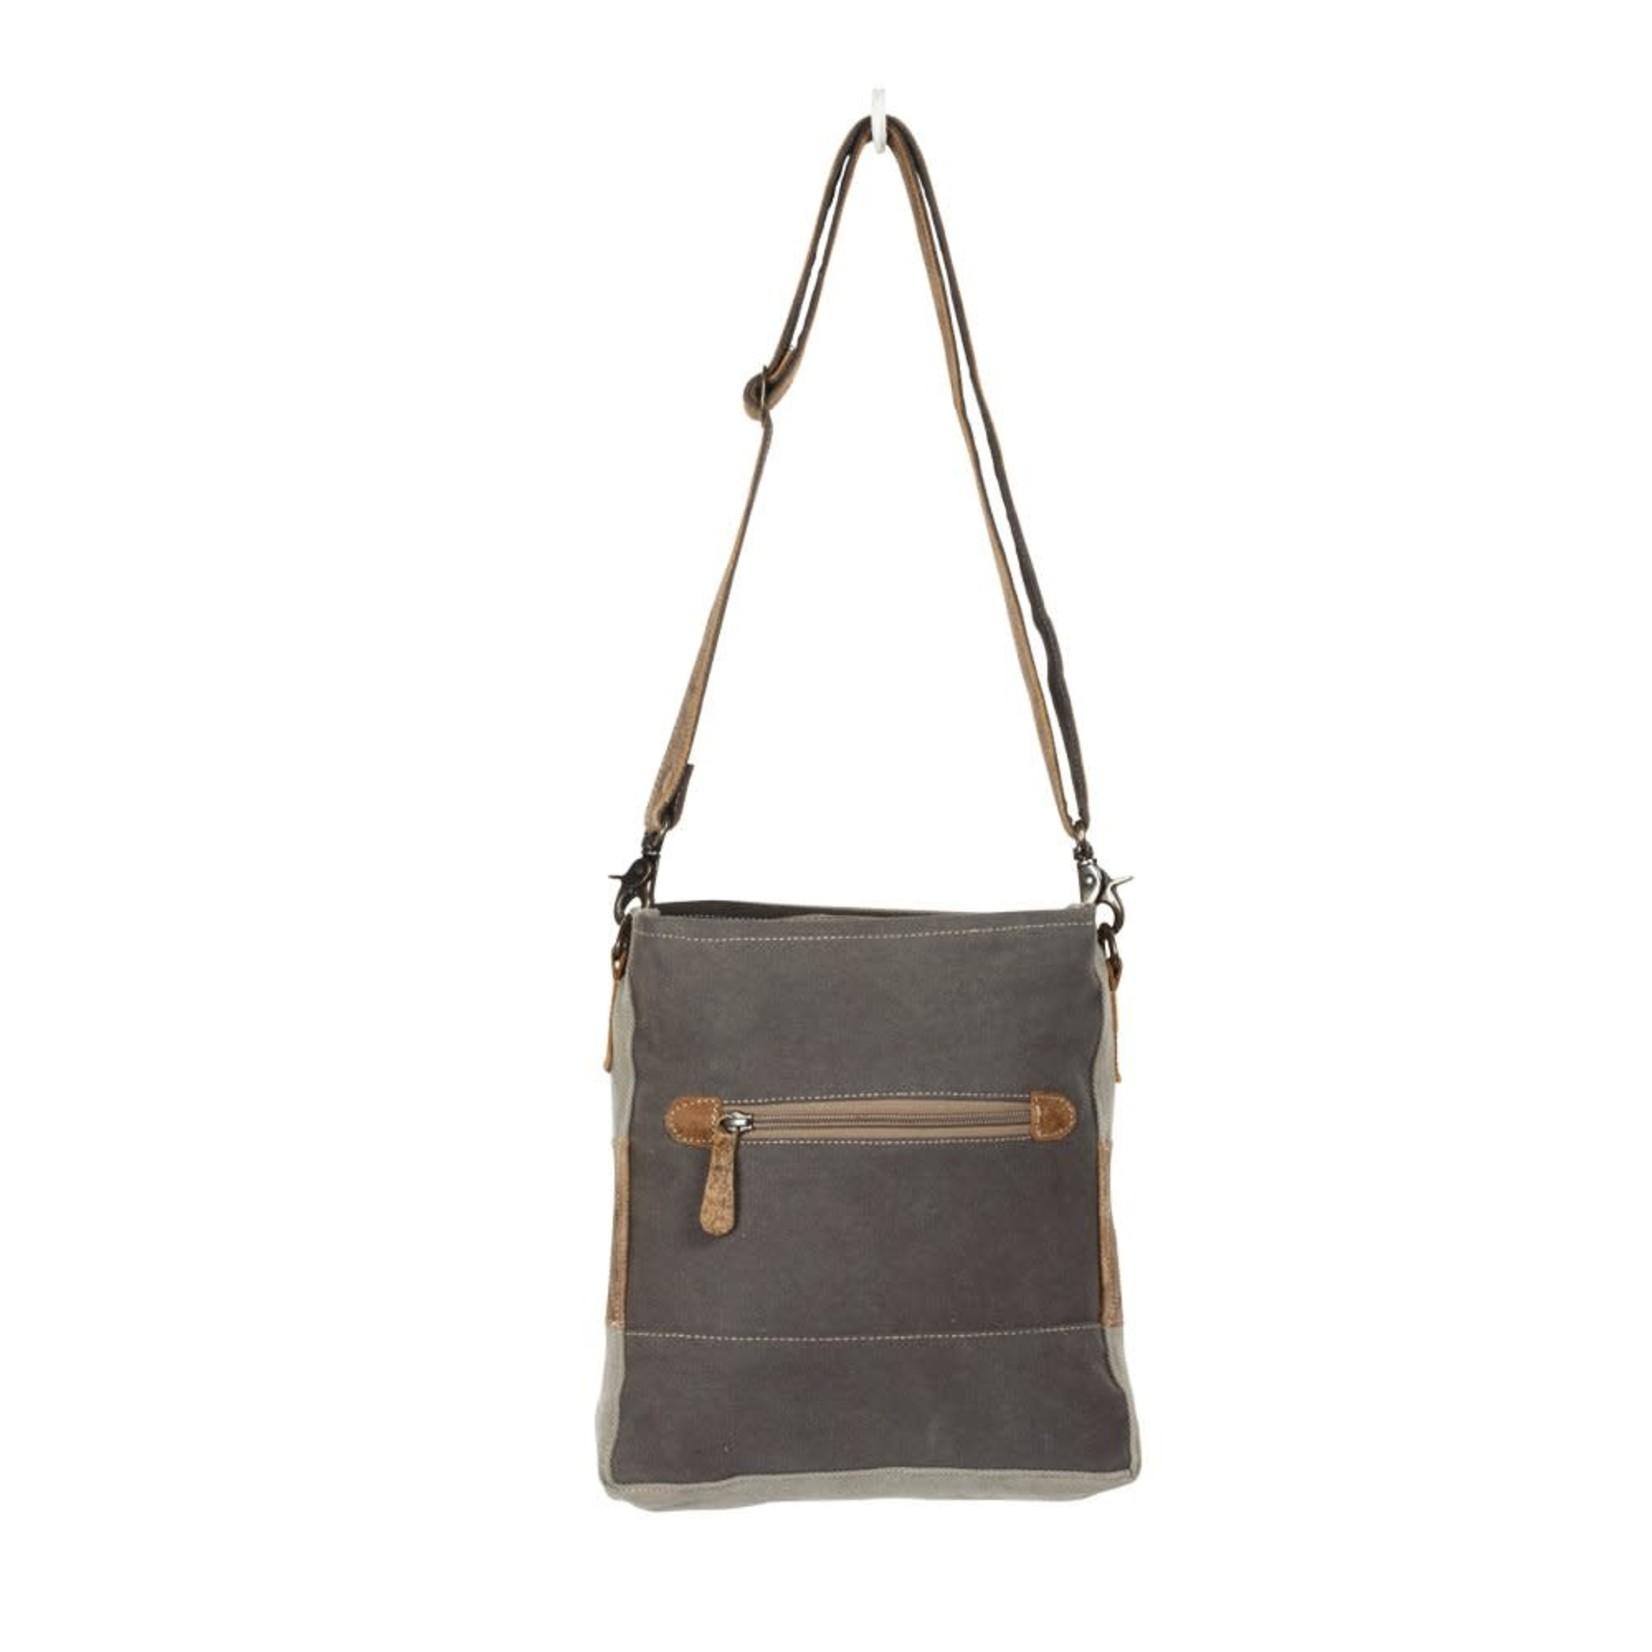 Myra Bags S-1366 Era 1930 Shoulder Bag